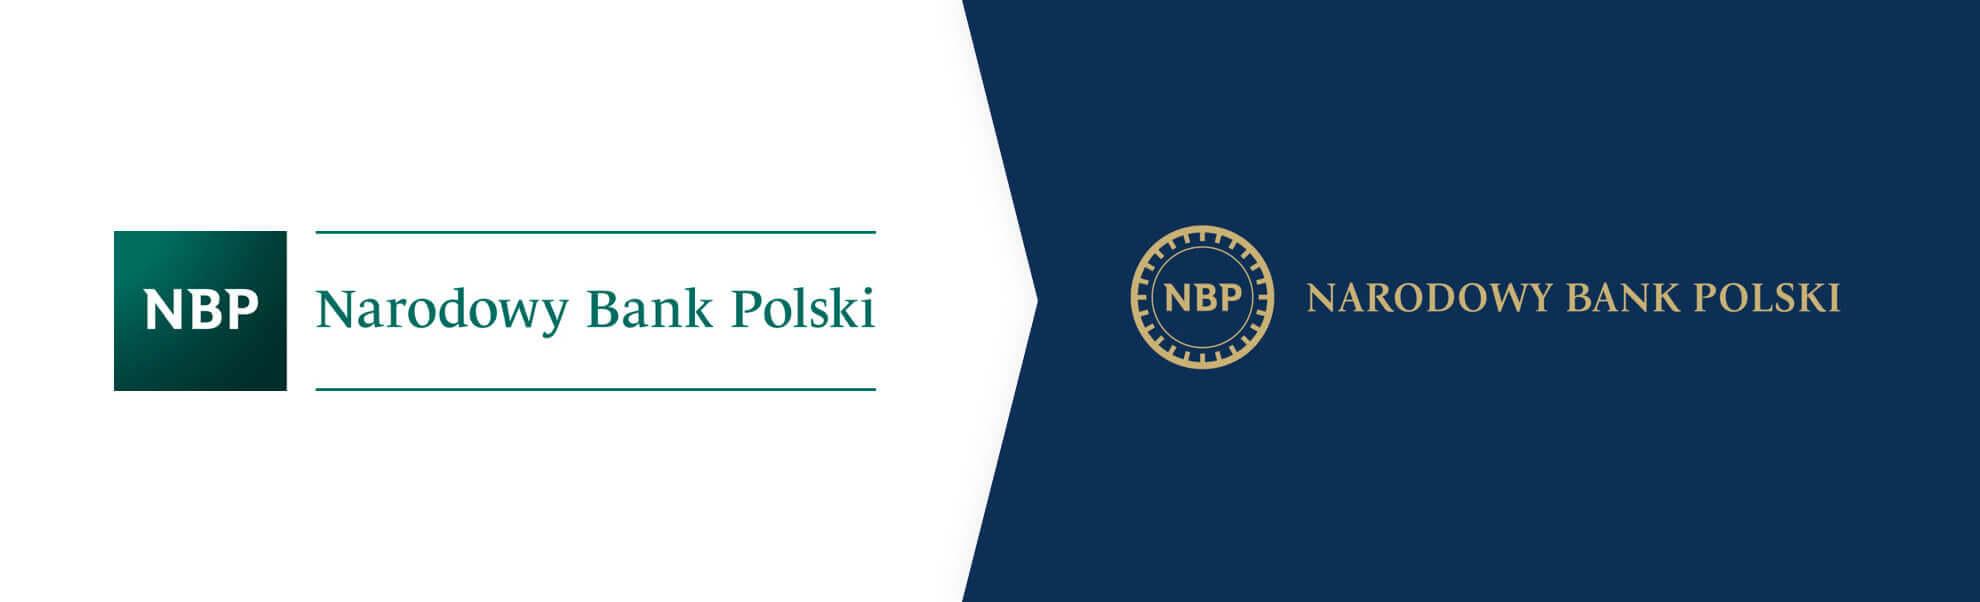 Stare i nowe logo NBP